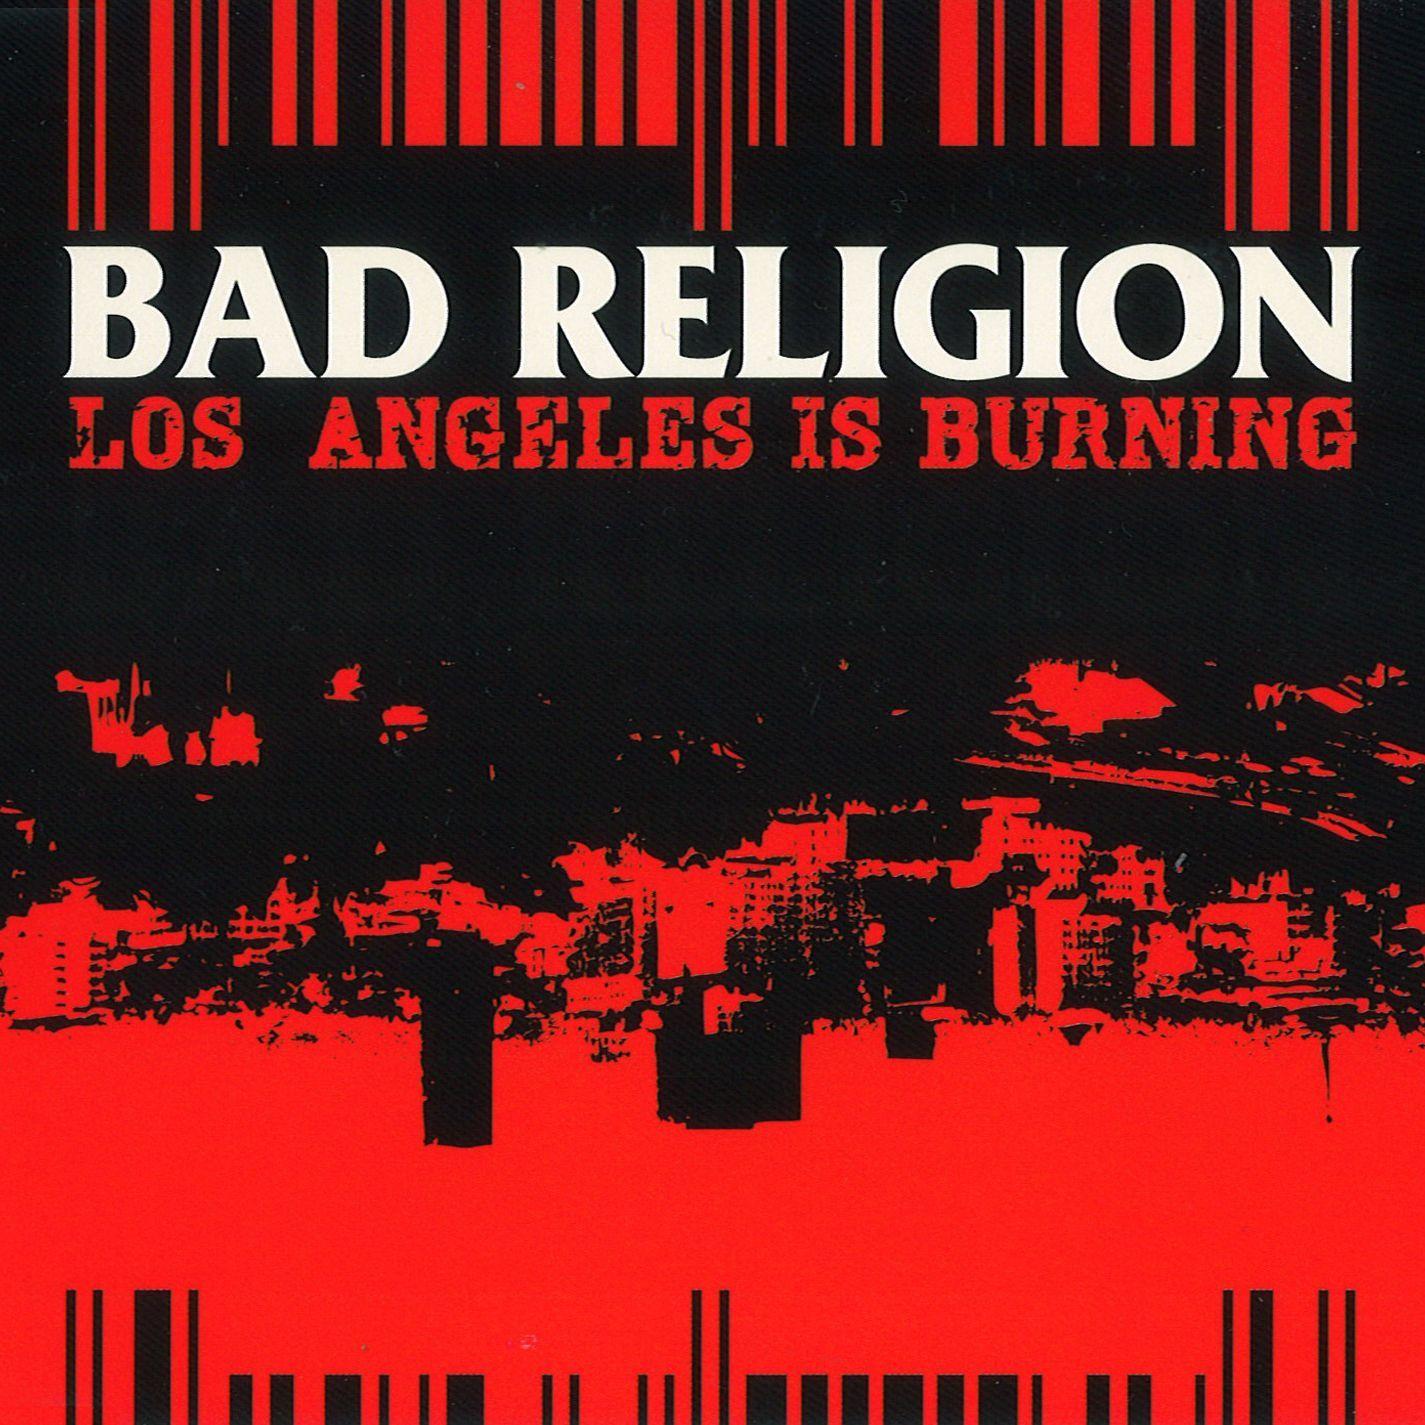 bad religion wallpaper 875 category bad religion image url wallpaper 1425x1425